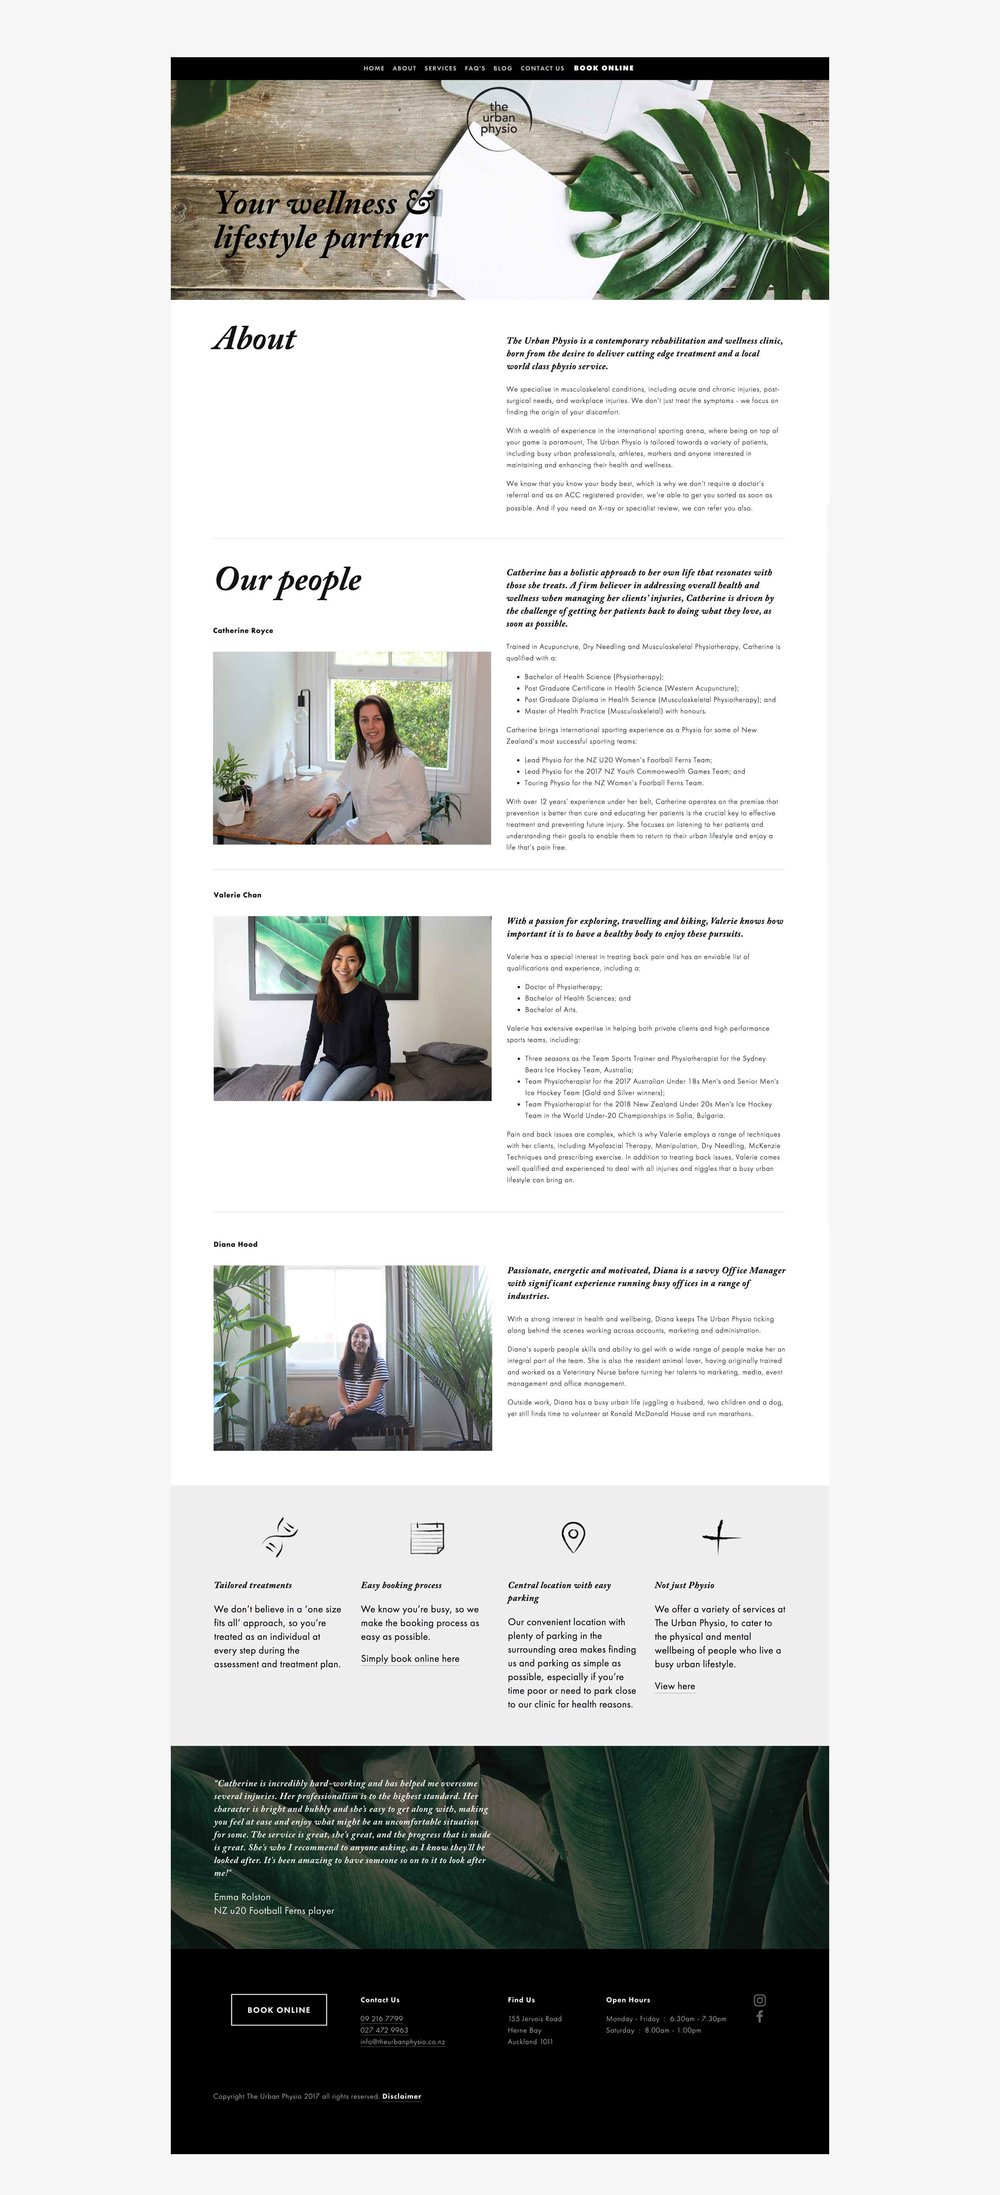 DetailStudio-TheUrbanPhysio-Website2.jpg